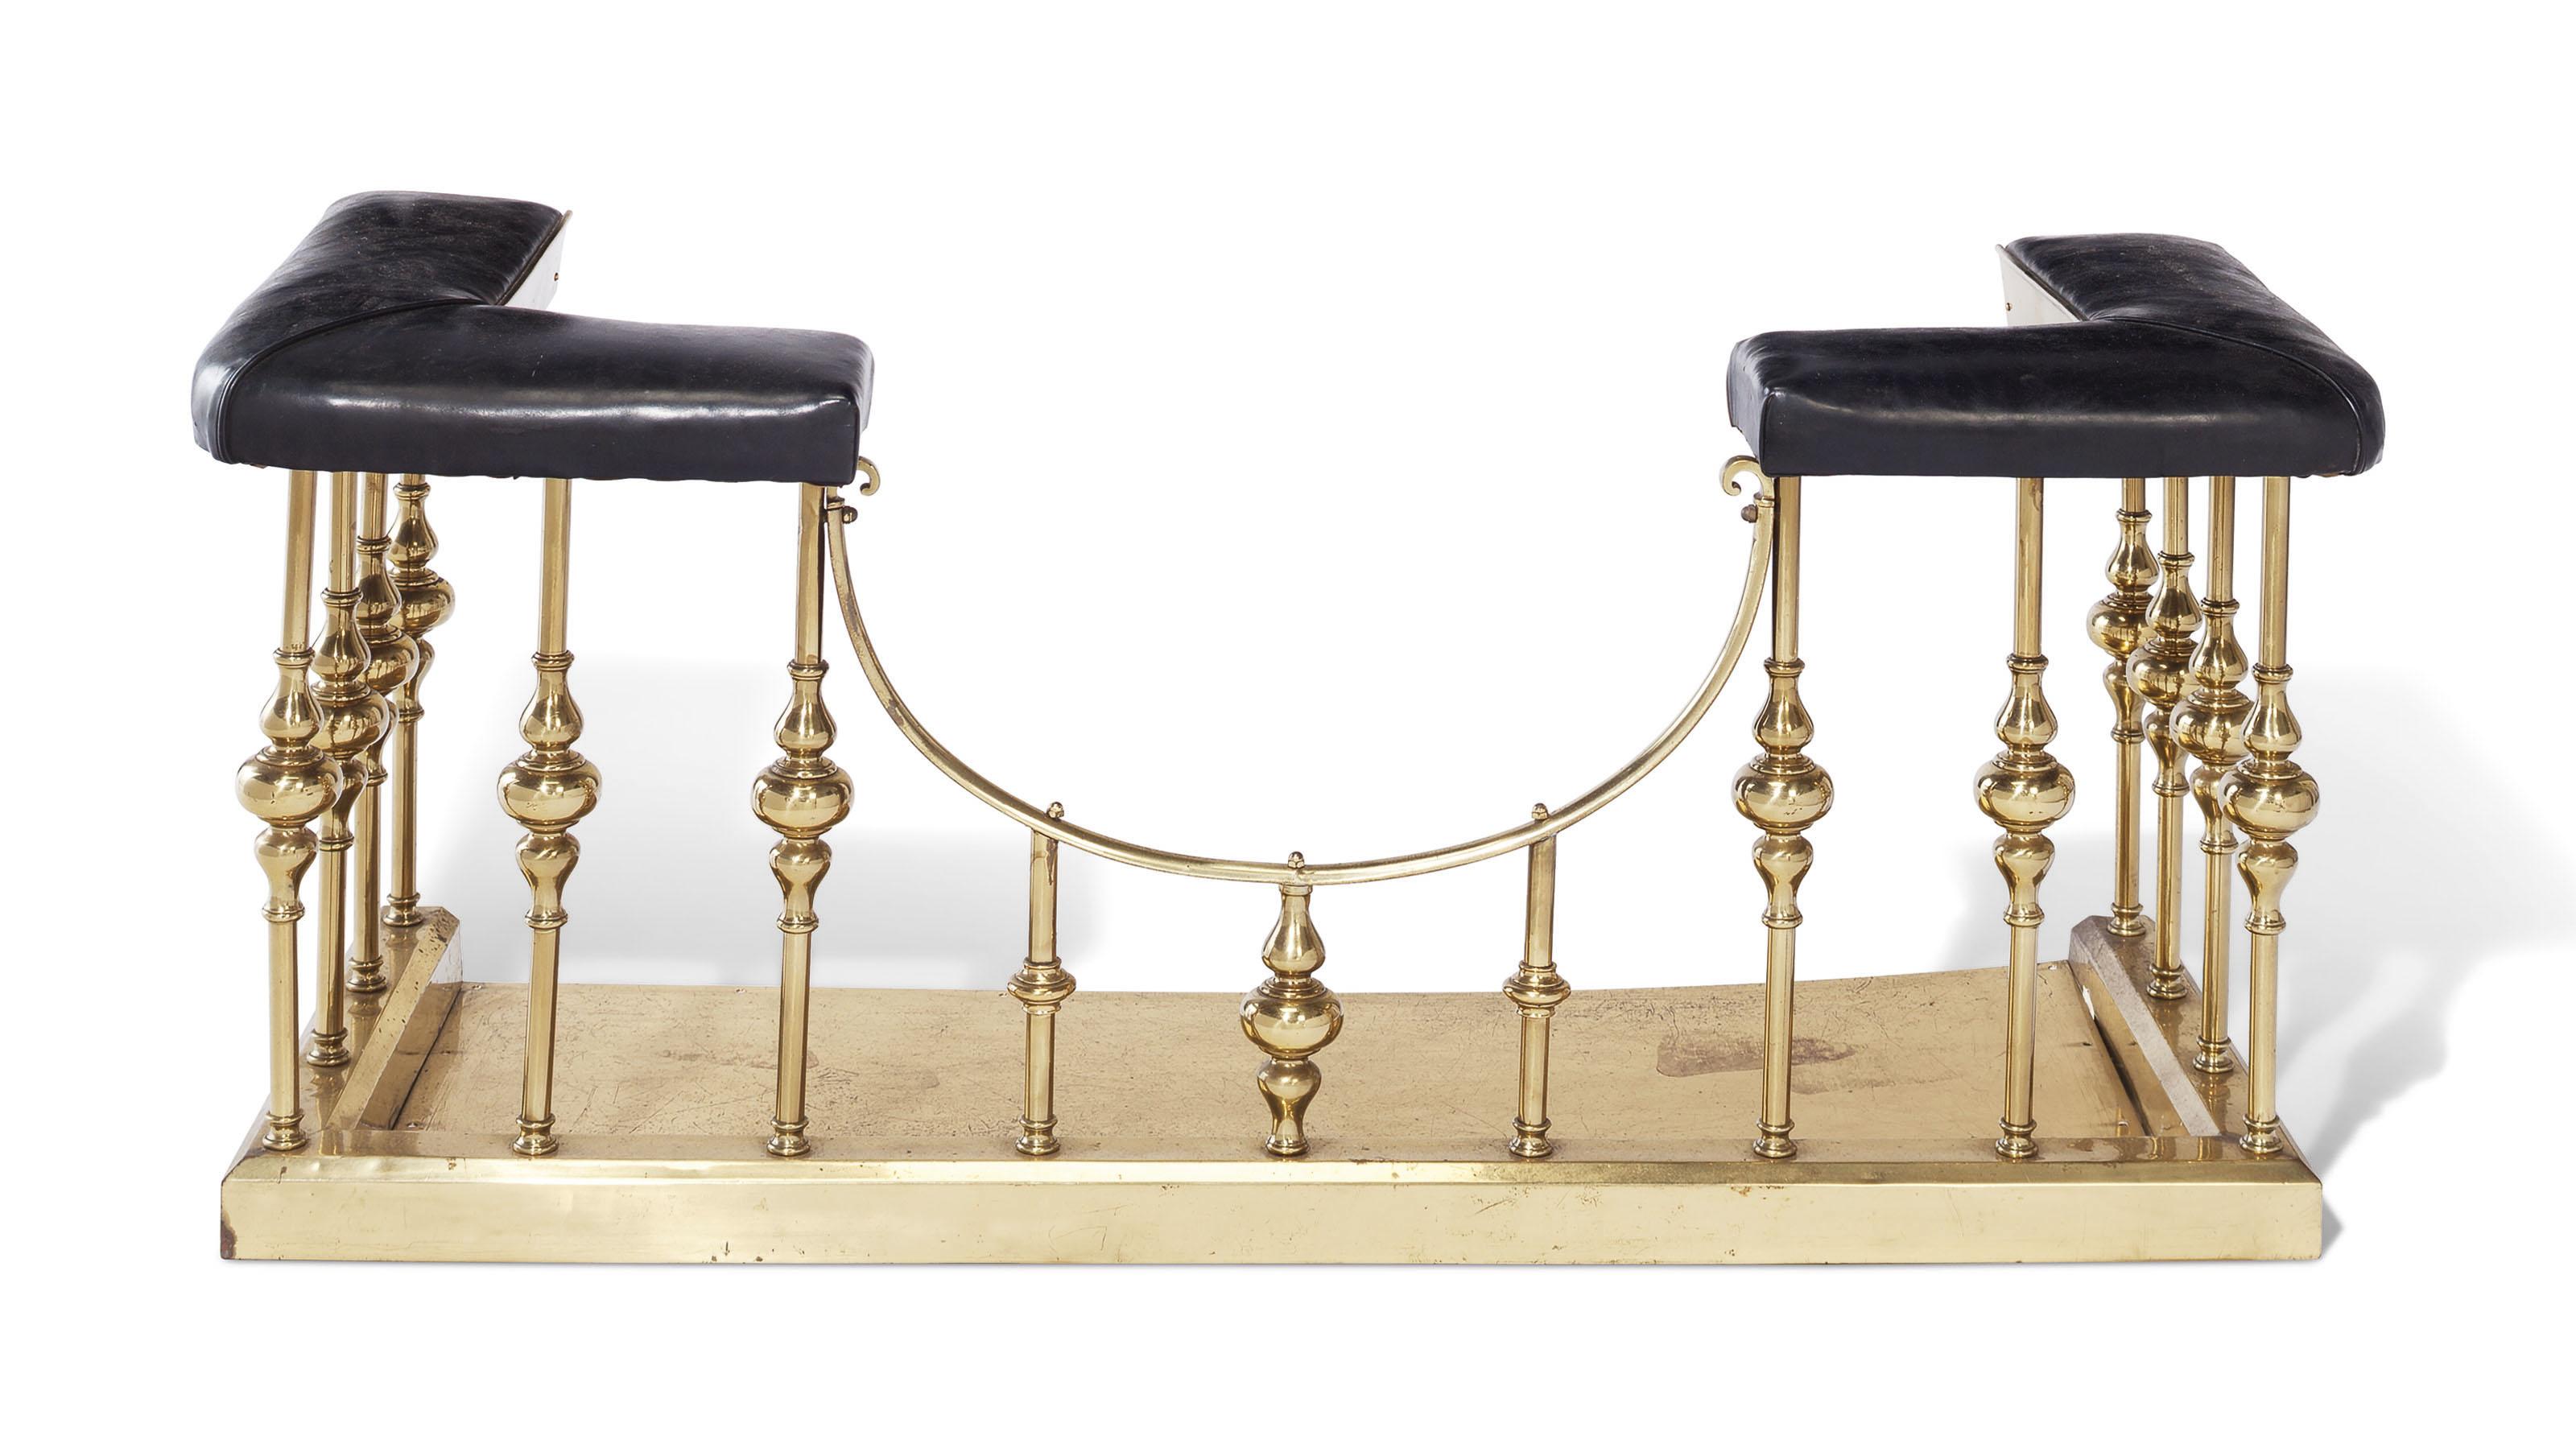 An English Brass Fireplace Fender 20th Century Furniture